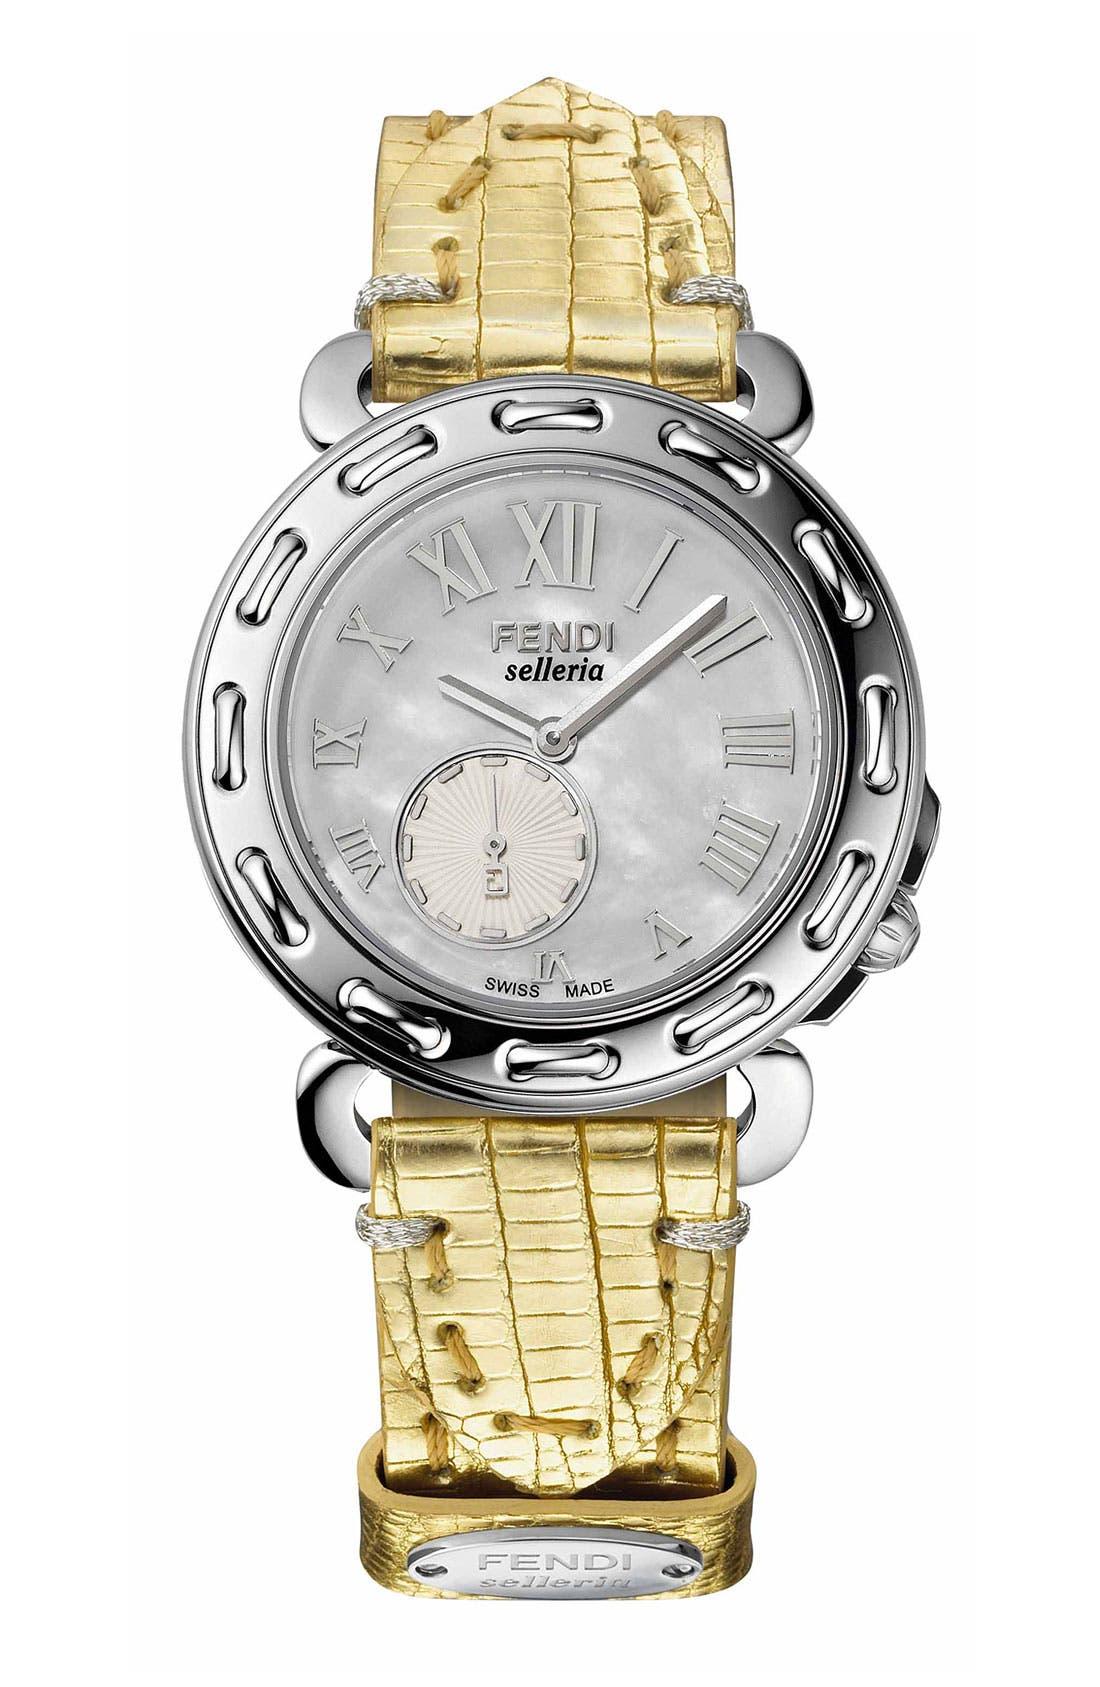 Main Image - Fendi 'Selleria' Customizable Watch